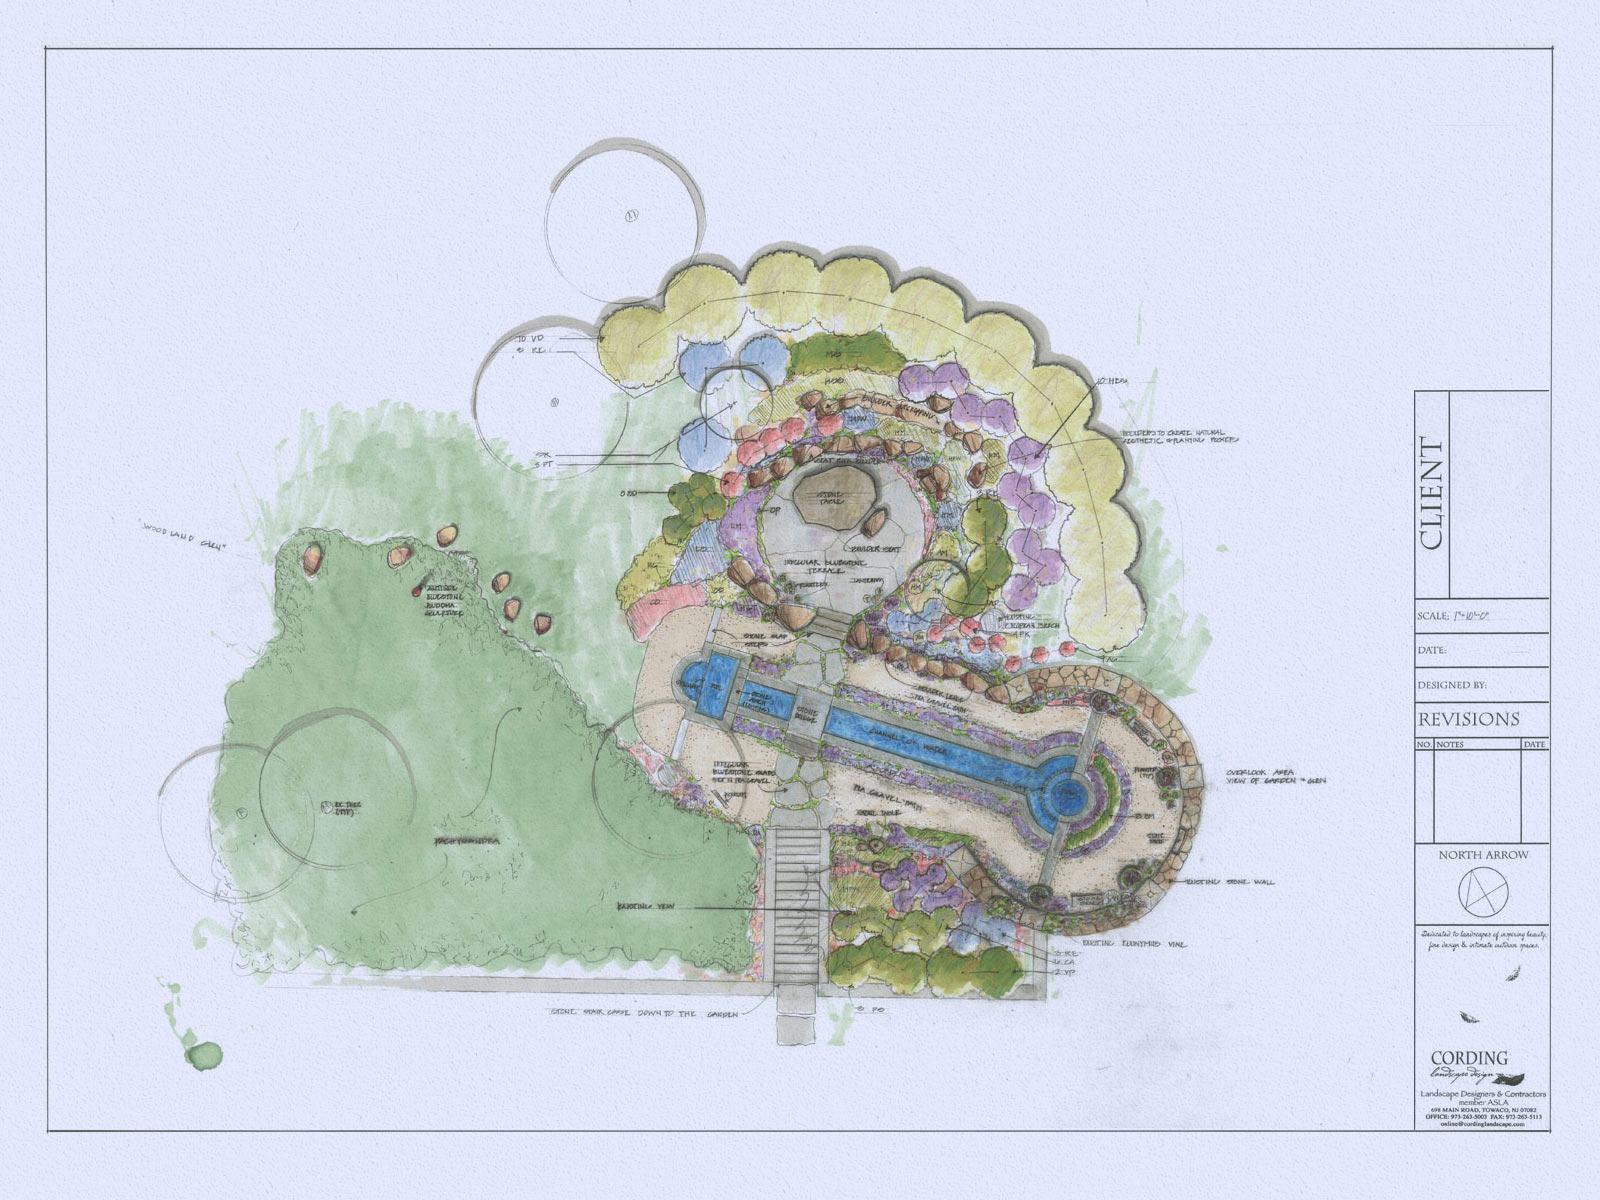 Landscape Plan by Cording Landscape Design in New Jersey